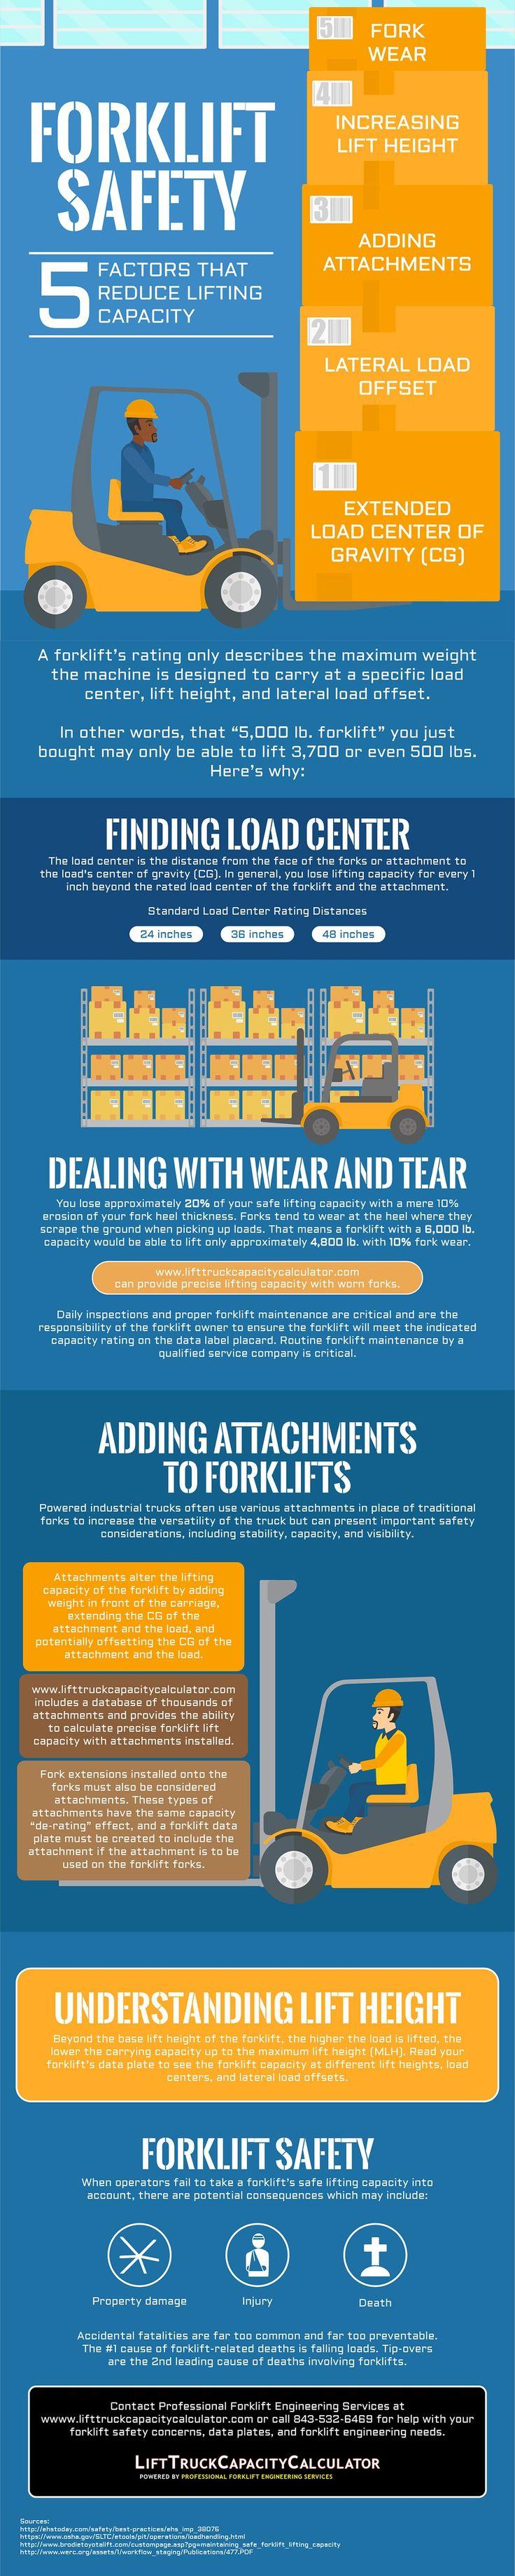 5 Factors That Reduce Lifting Capacity